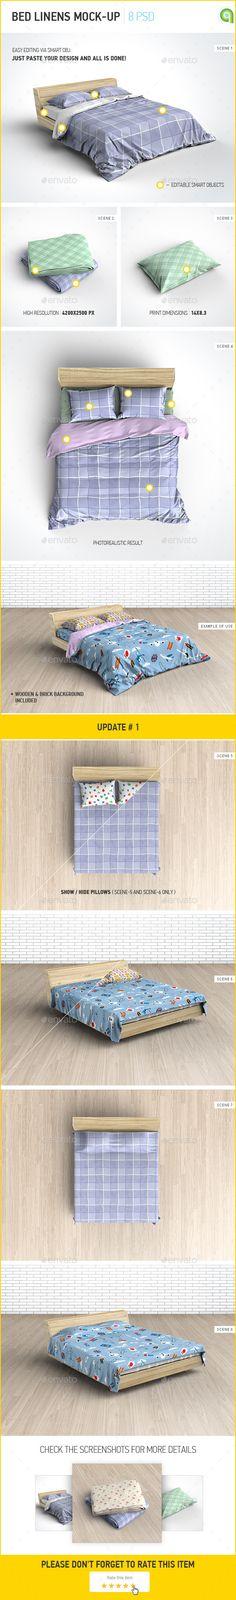 Bed Linens Mock-Up / Bedding Set Template Download her: https://graphicriver.net/item/bed-linens-mockup-bedding-set-template/9774753?ref=KlitVogli